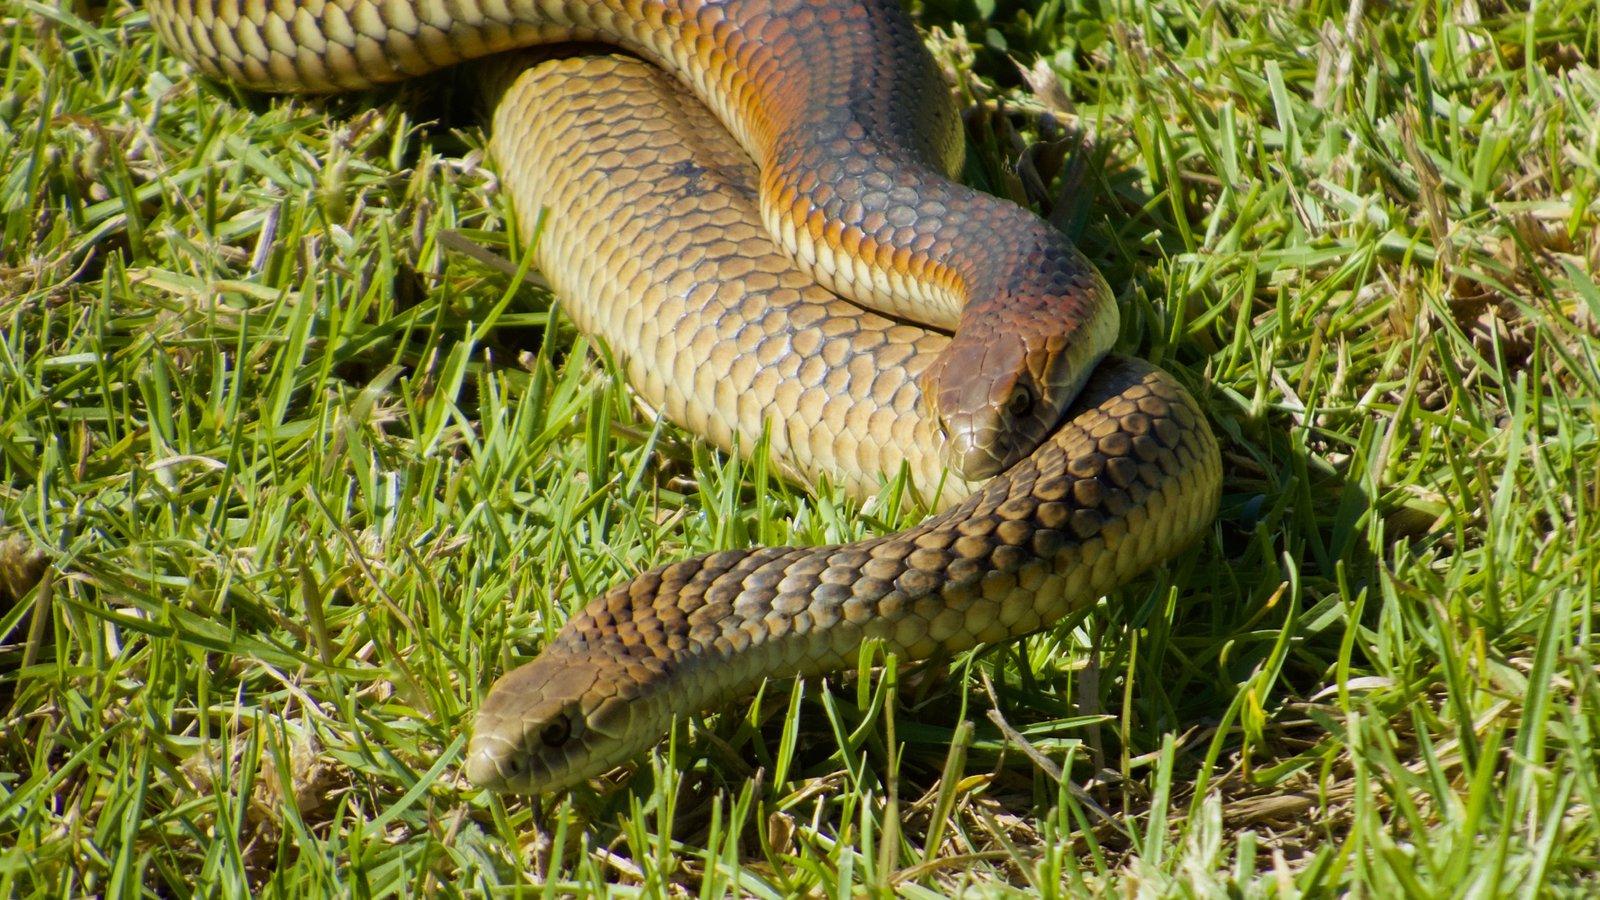 Copperhead snakes